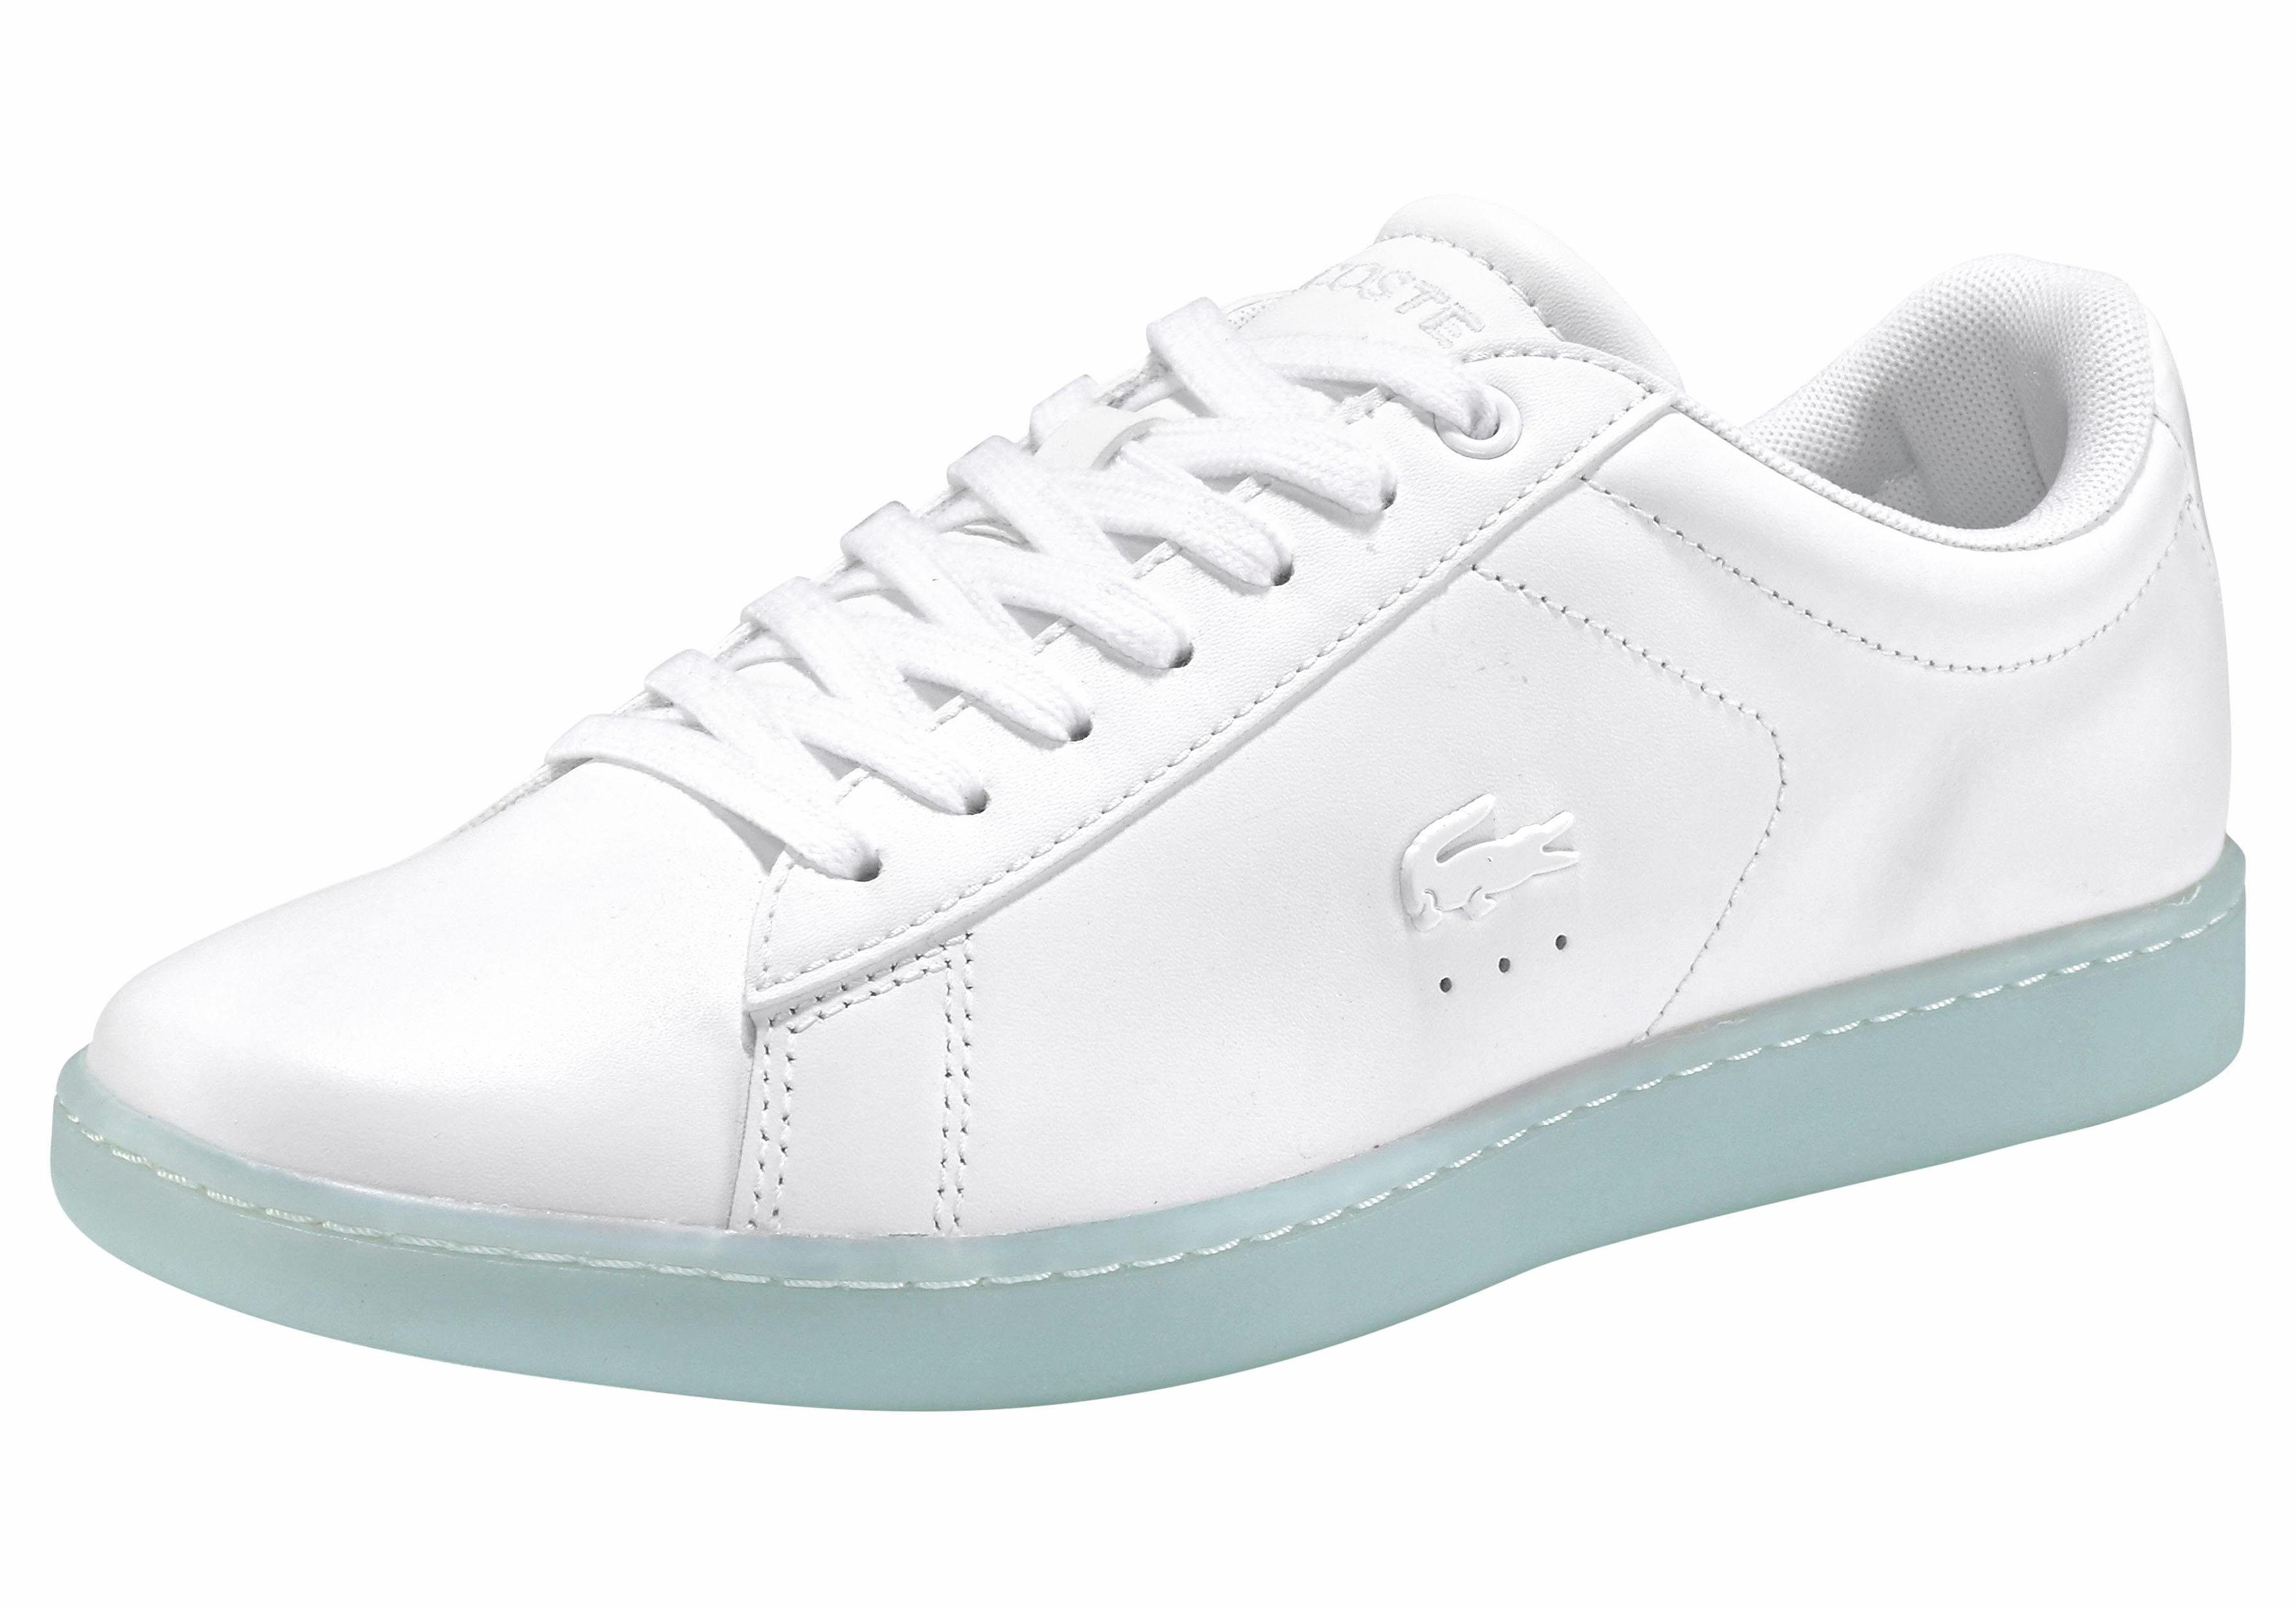 Chaussures De Sport Lage Lacoste Carnaby Evo 118 3 Femmes mk4TBa